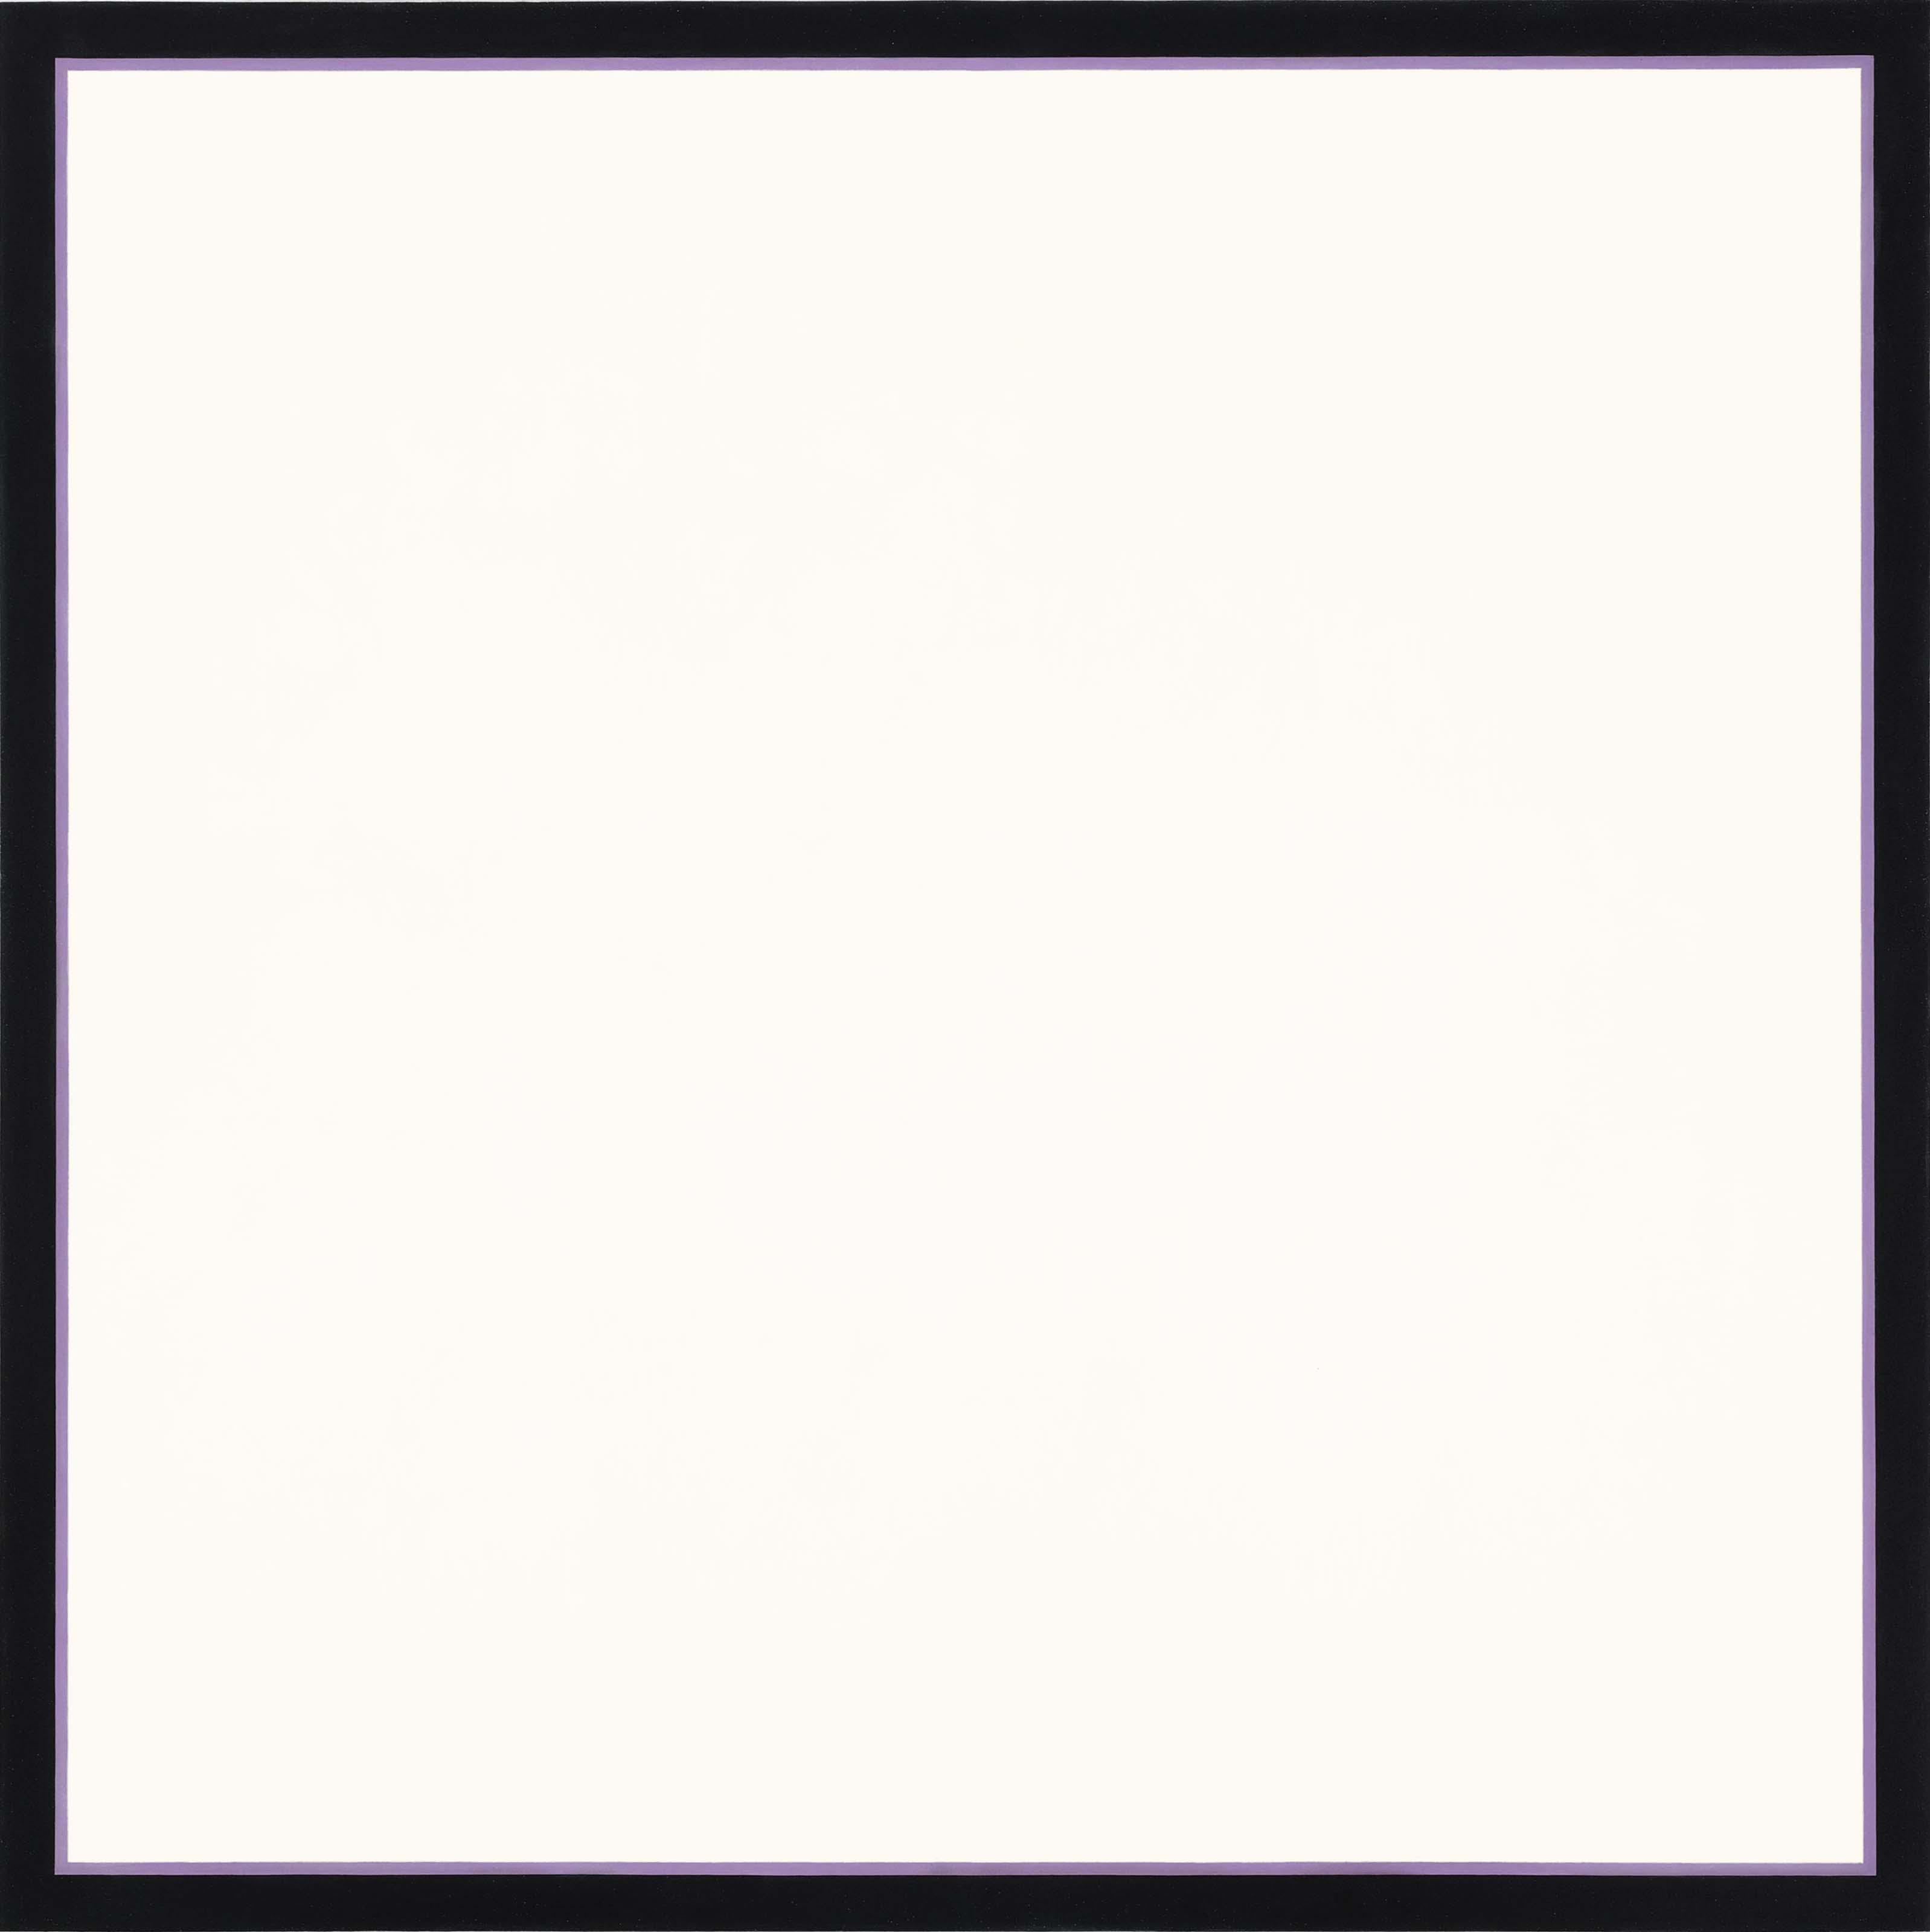 Untitled (White Square Lavender)